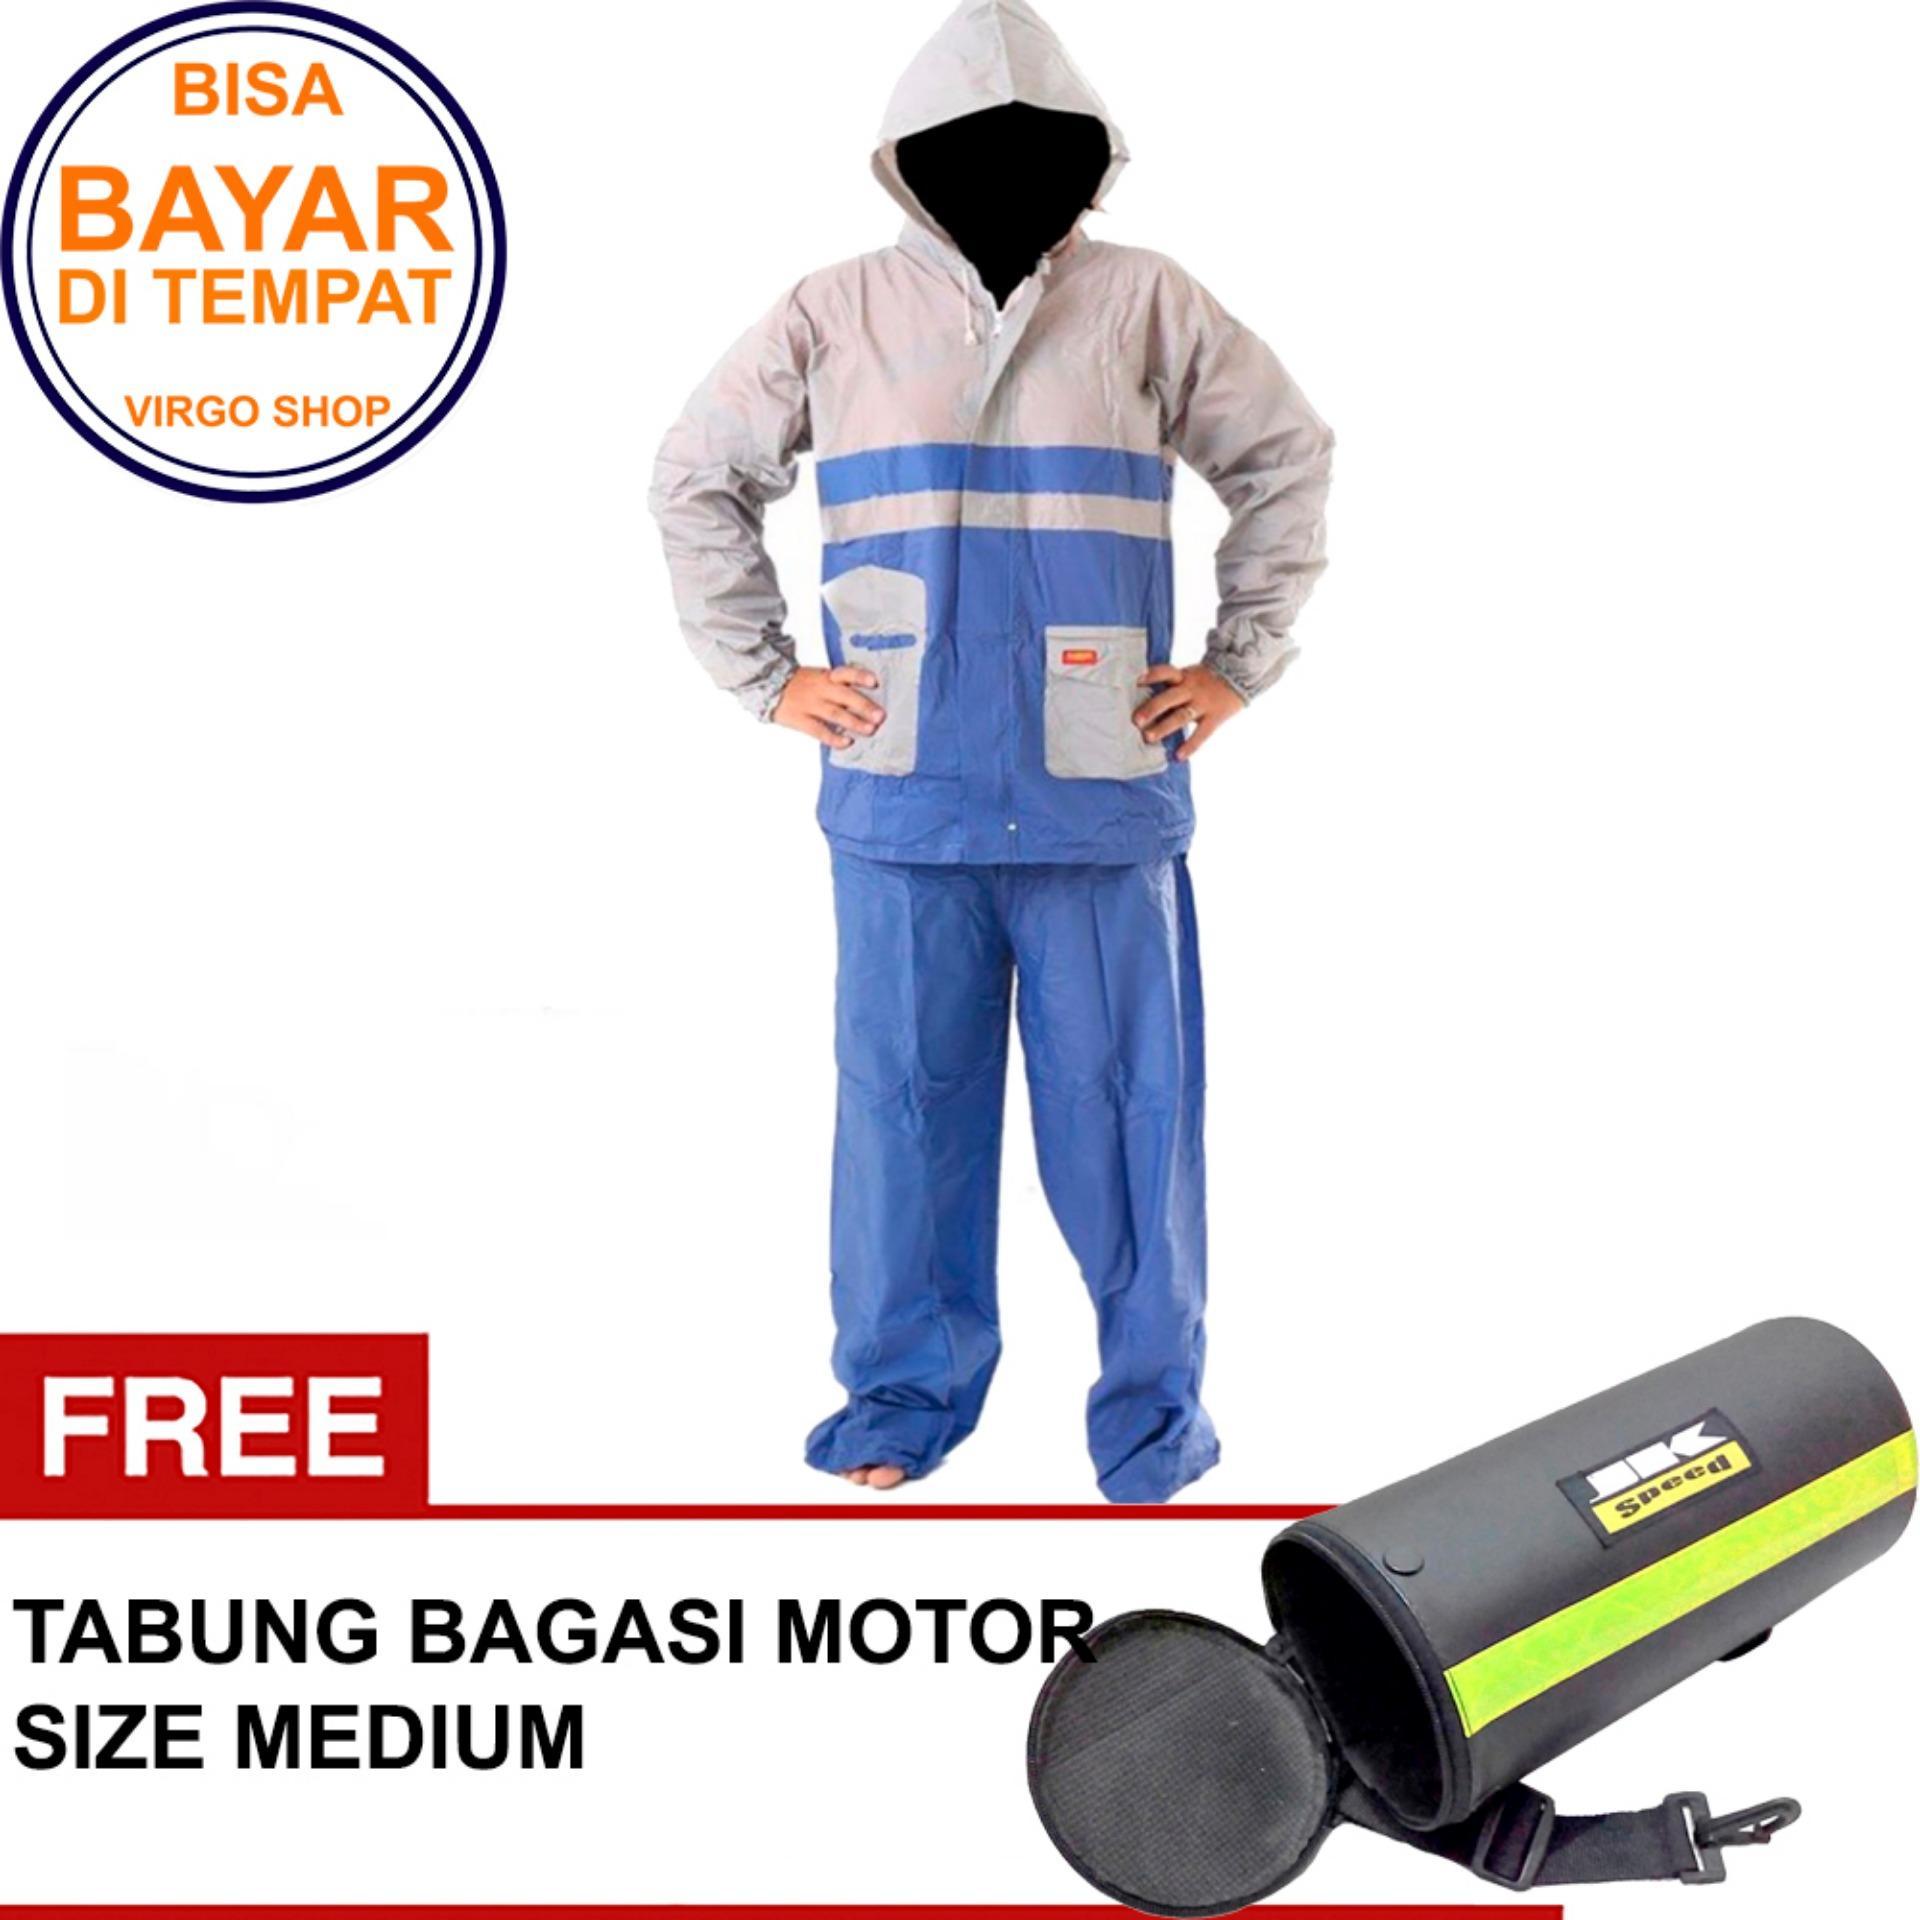 Termurah Elmondo Jas Hujan Setelan Baju Celana - New Kombinasi Tipe 905 Biru Bonus Tabung Bagasi Medium